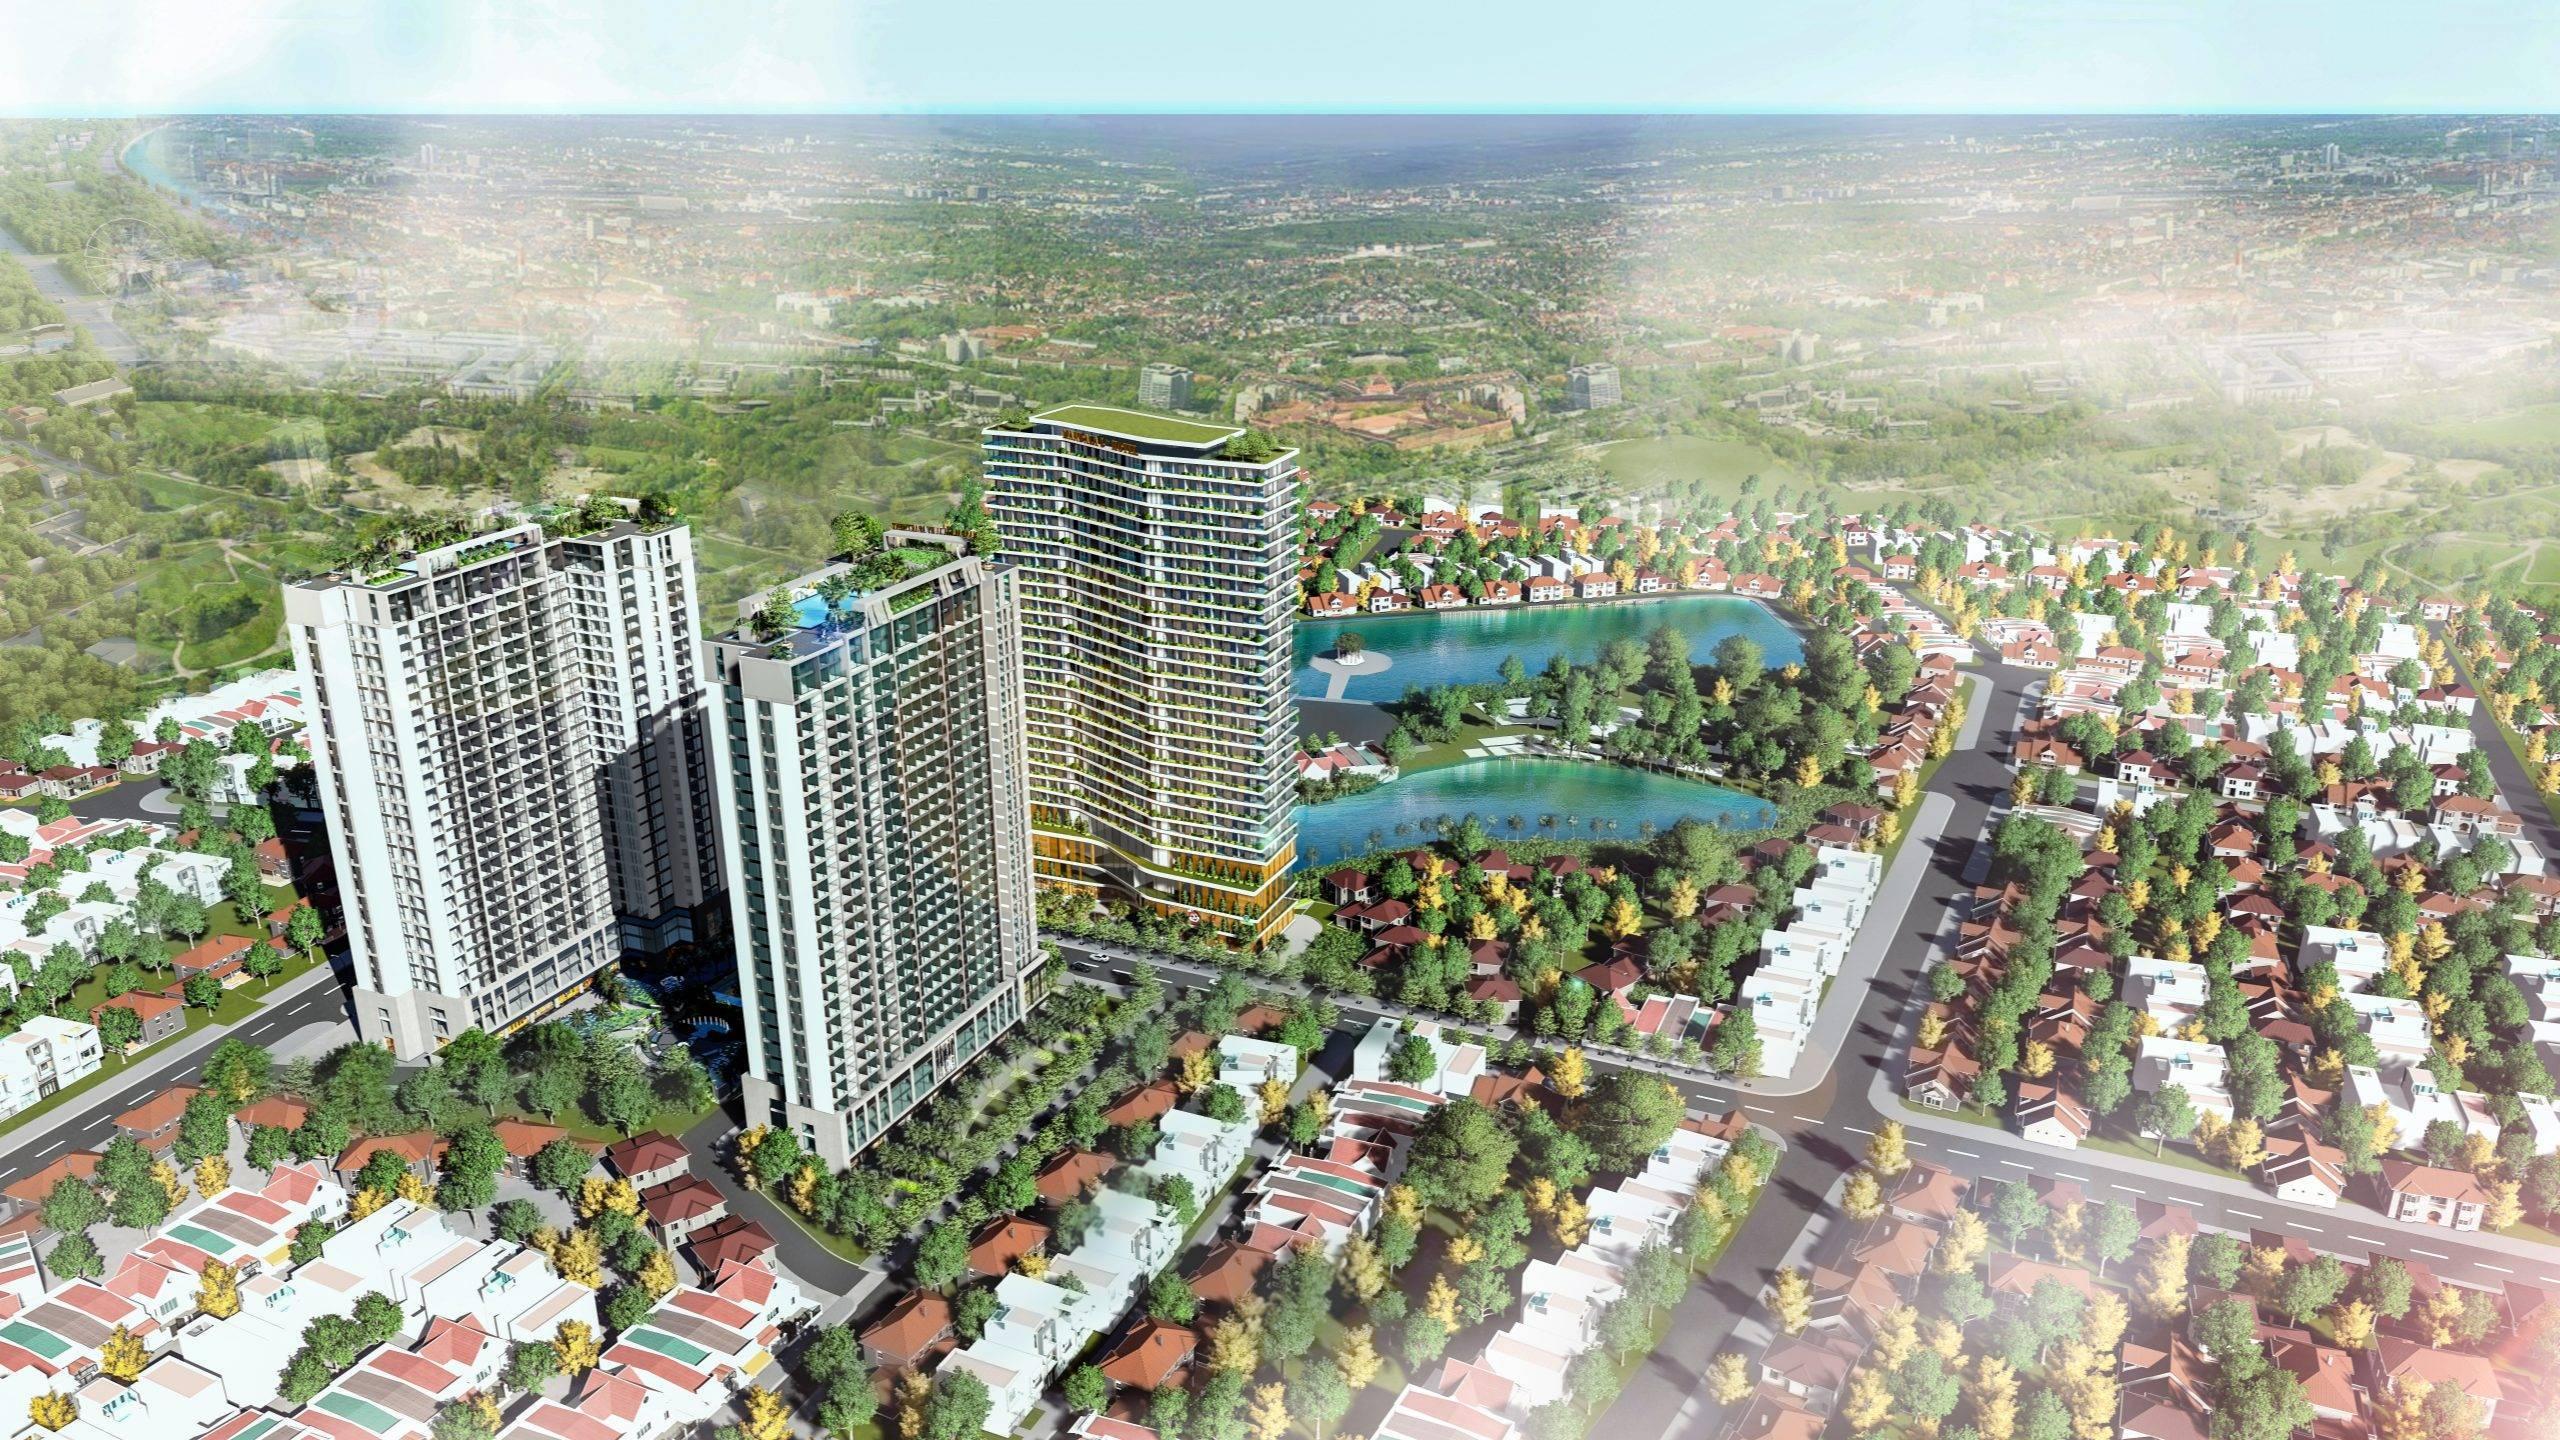 Chung Cư Apec Aqua Park Bắc Giang